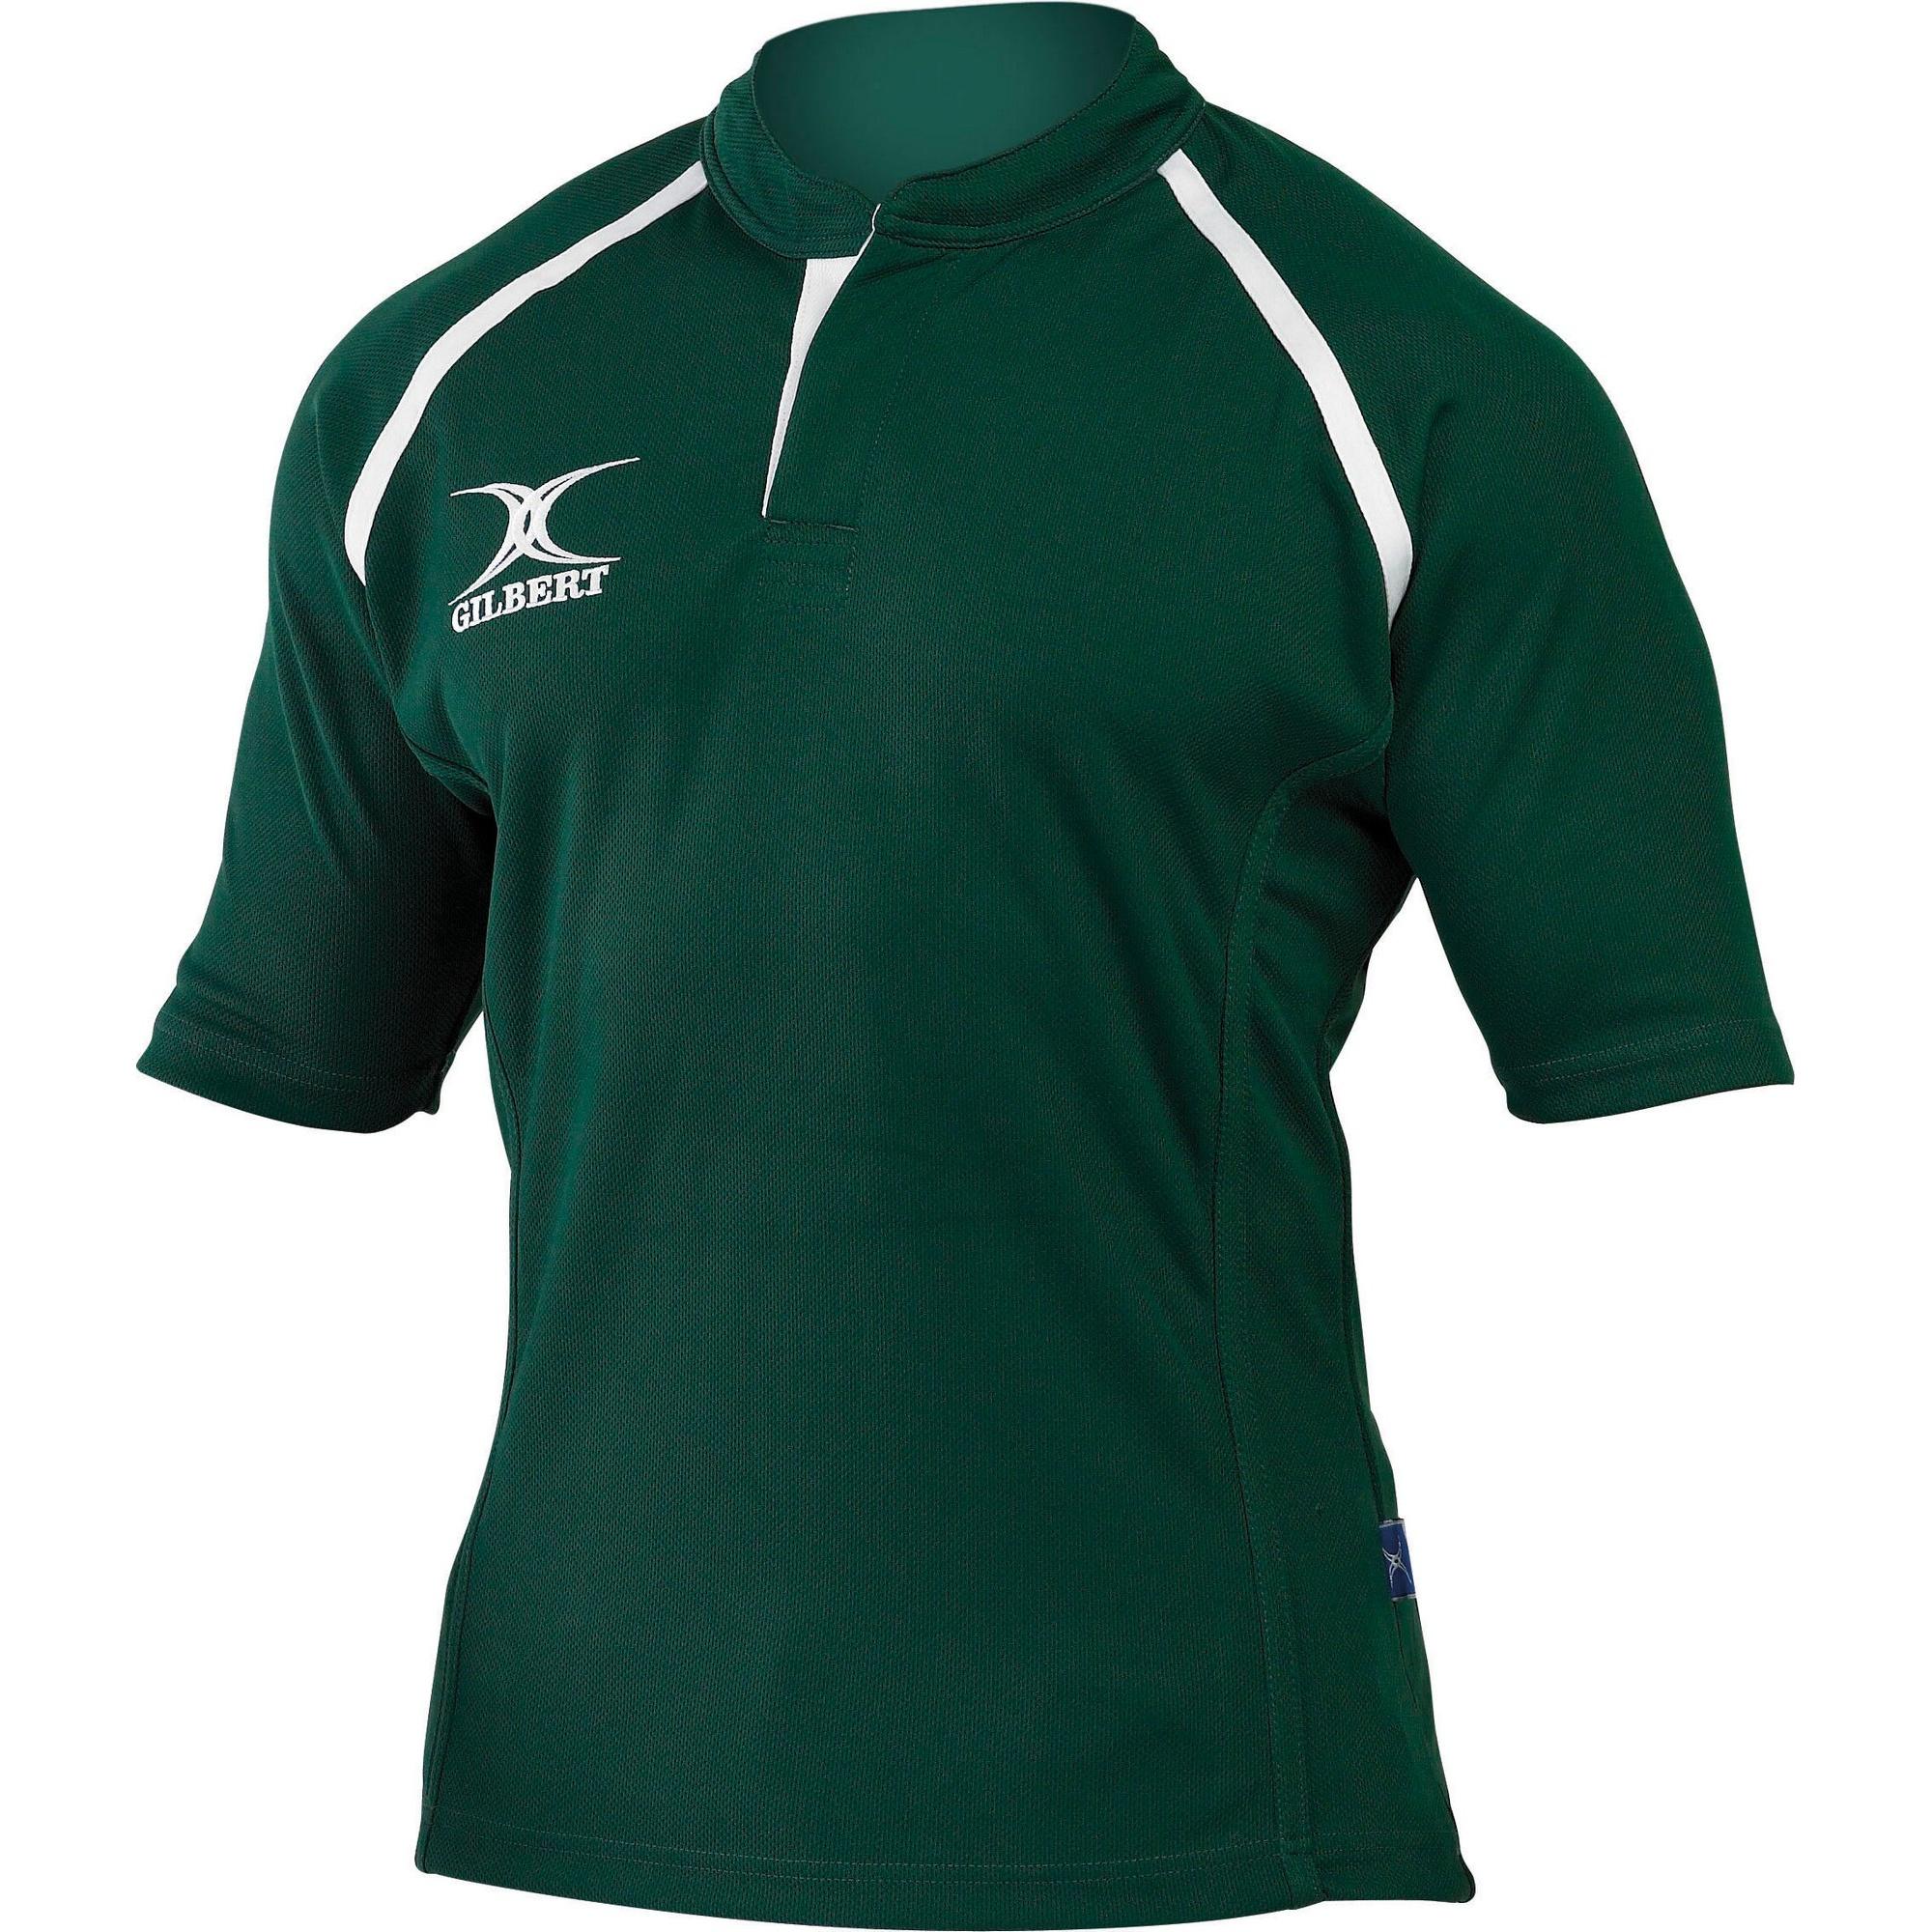 Gilbert Rugby Childrens/Kids Xact Match Short Sleeved Rugby Shirt (5-6 Years) (Green)